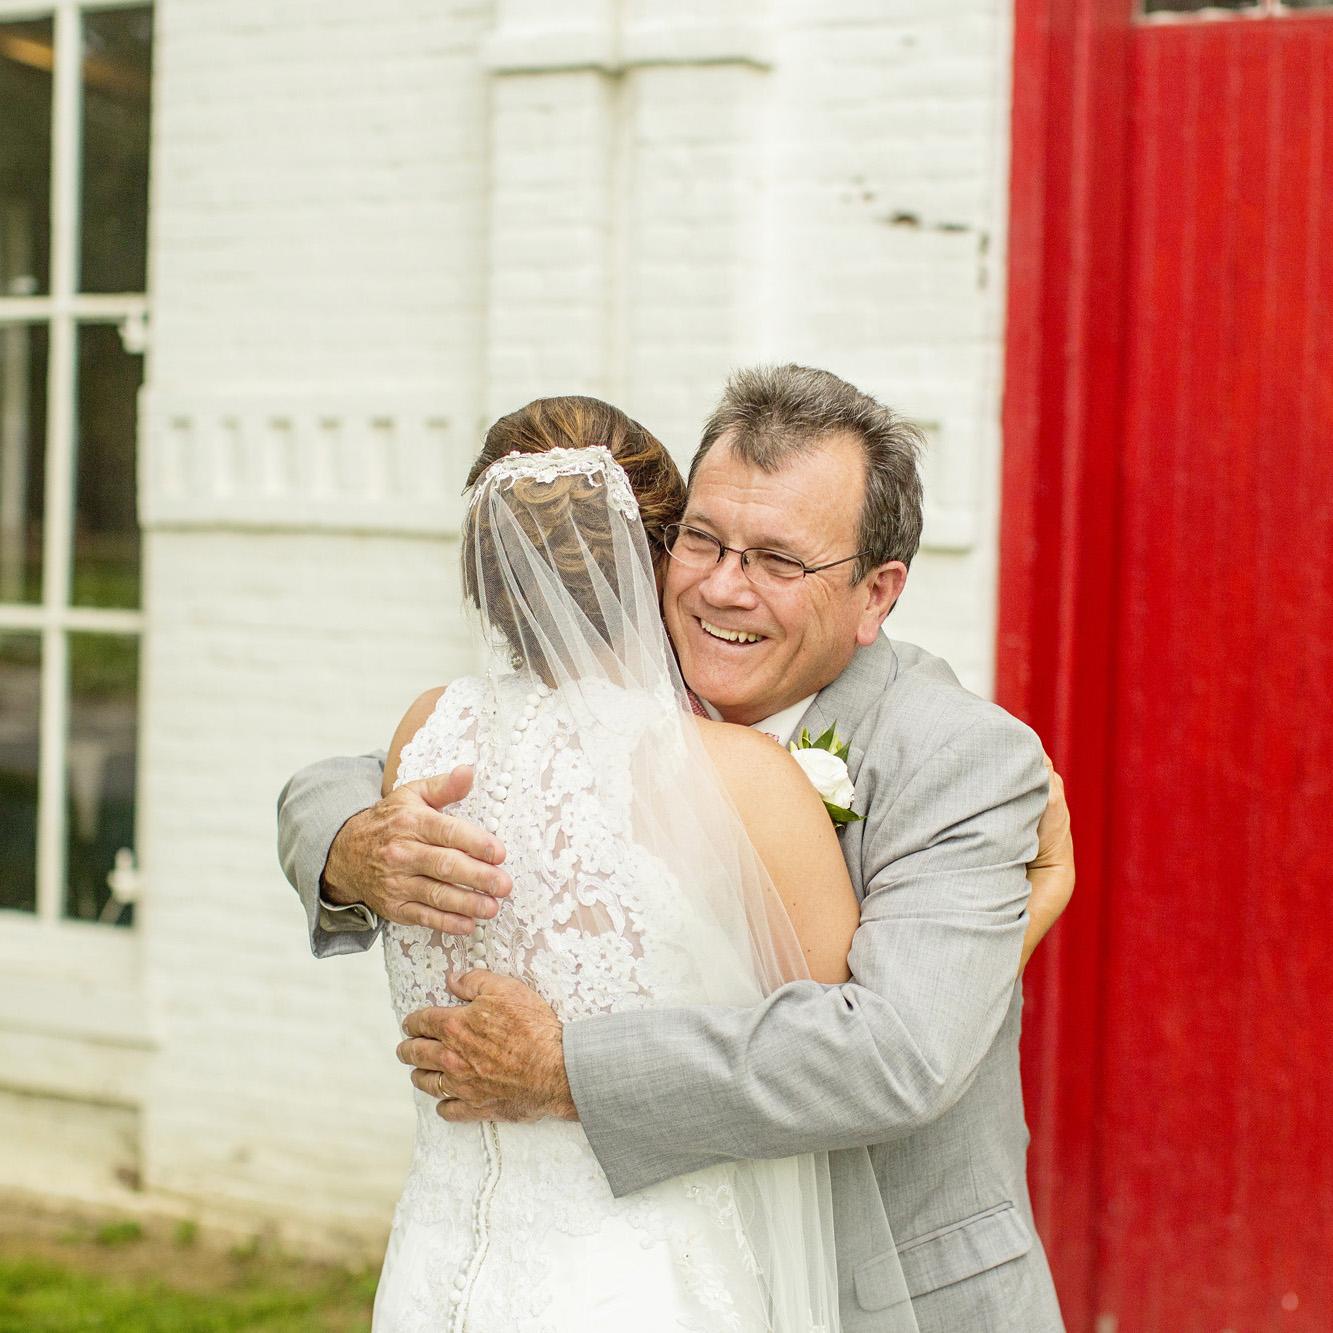 Seriously_Sabrina_Photography_Lexington_Kentucky_Round_Barn_Red_Mile_Stable_of_Memories_Wedding_Hart_44.jpg